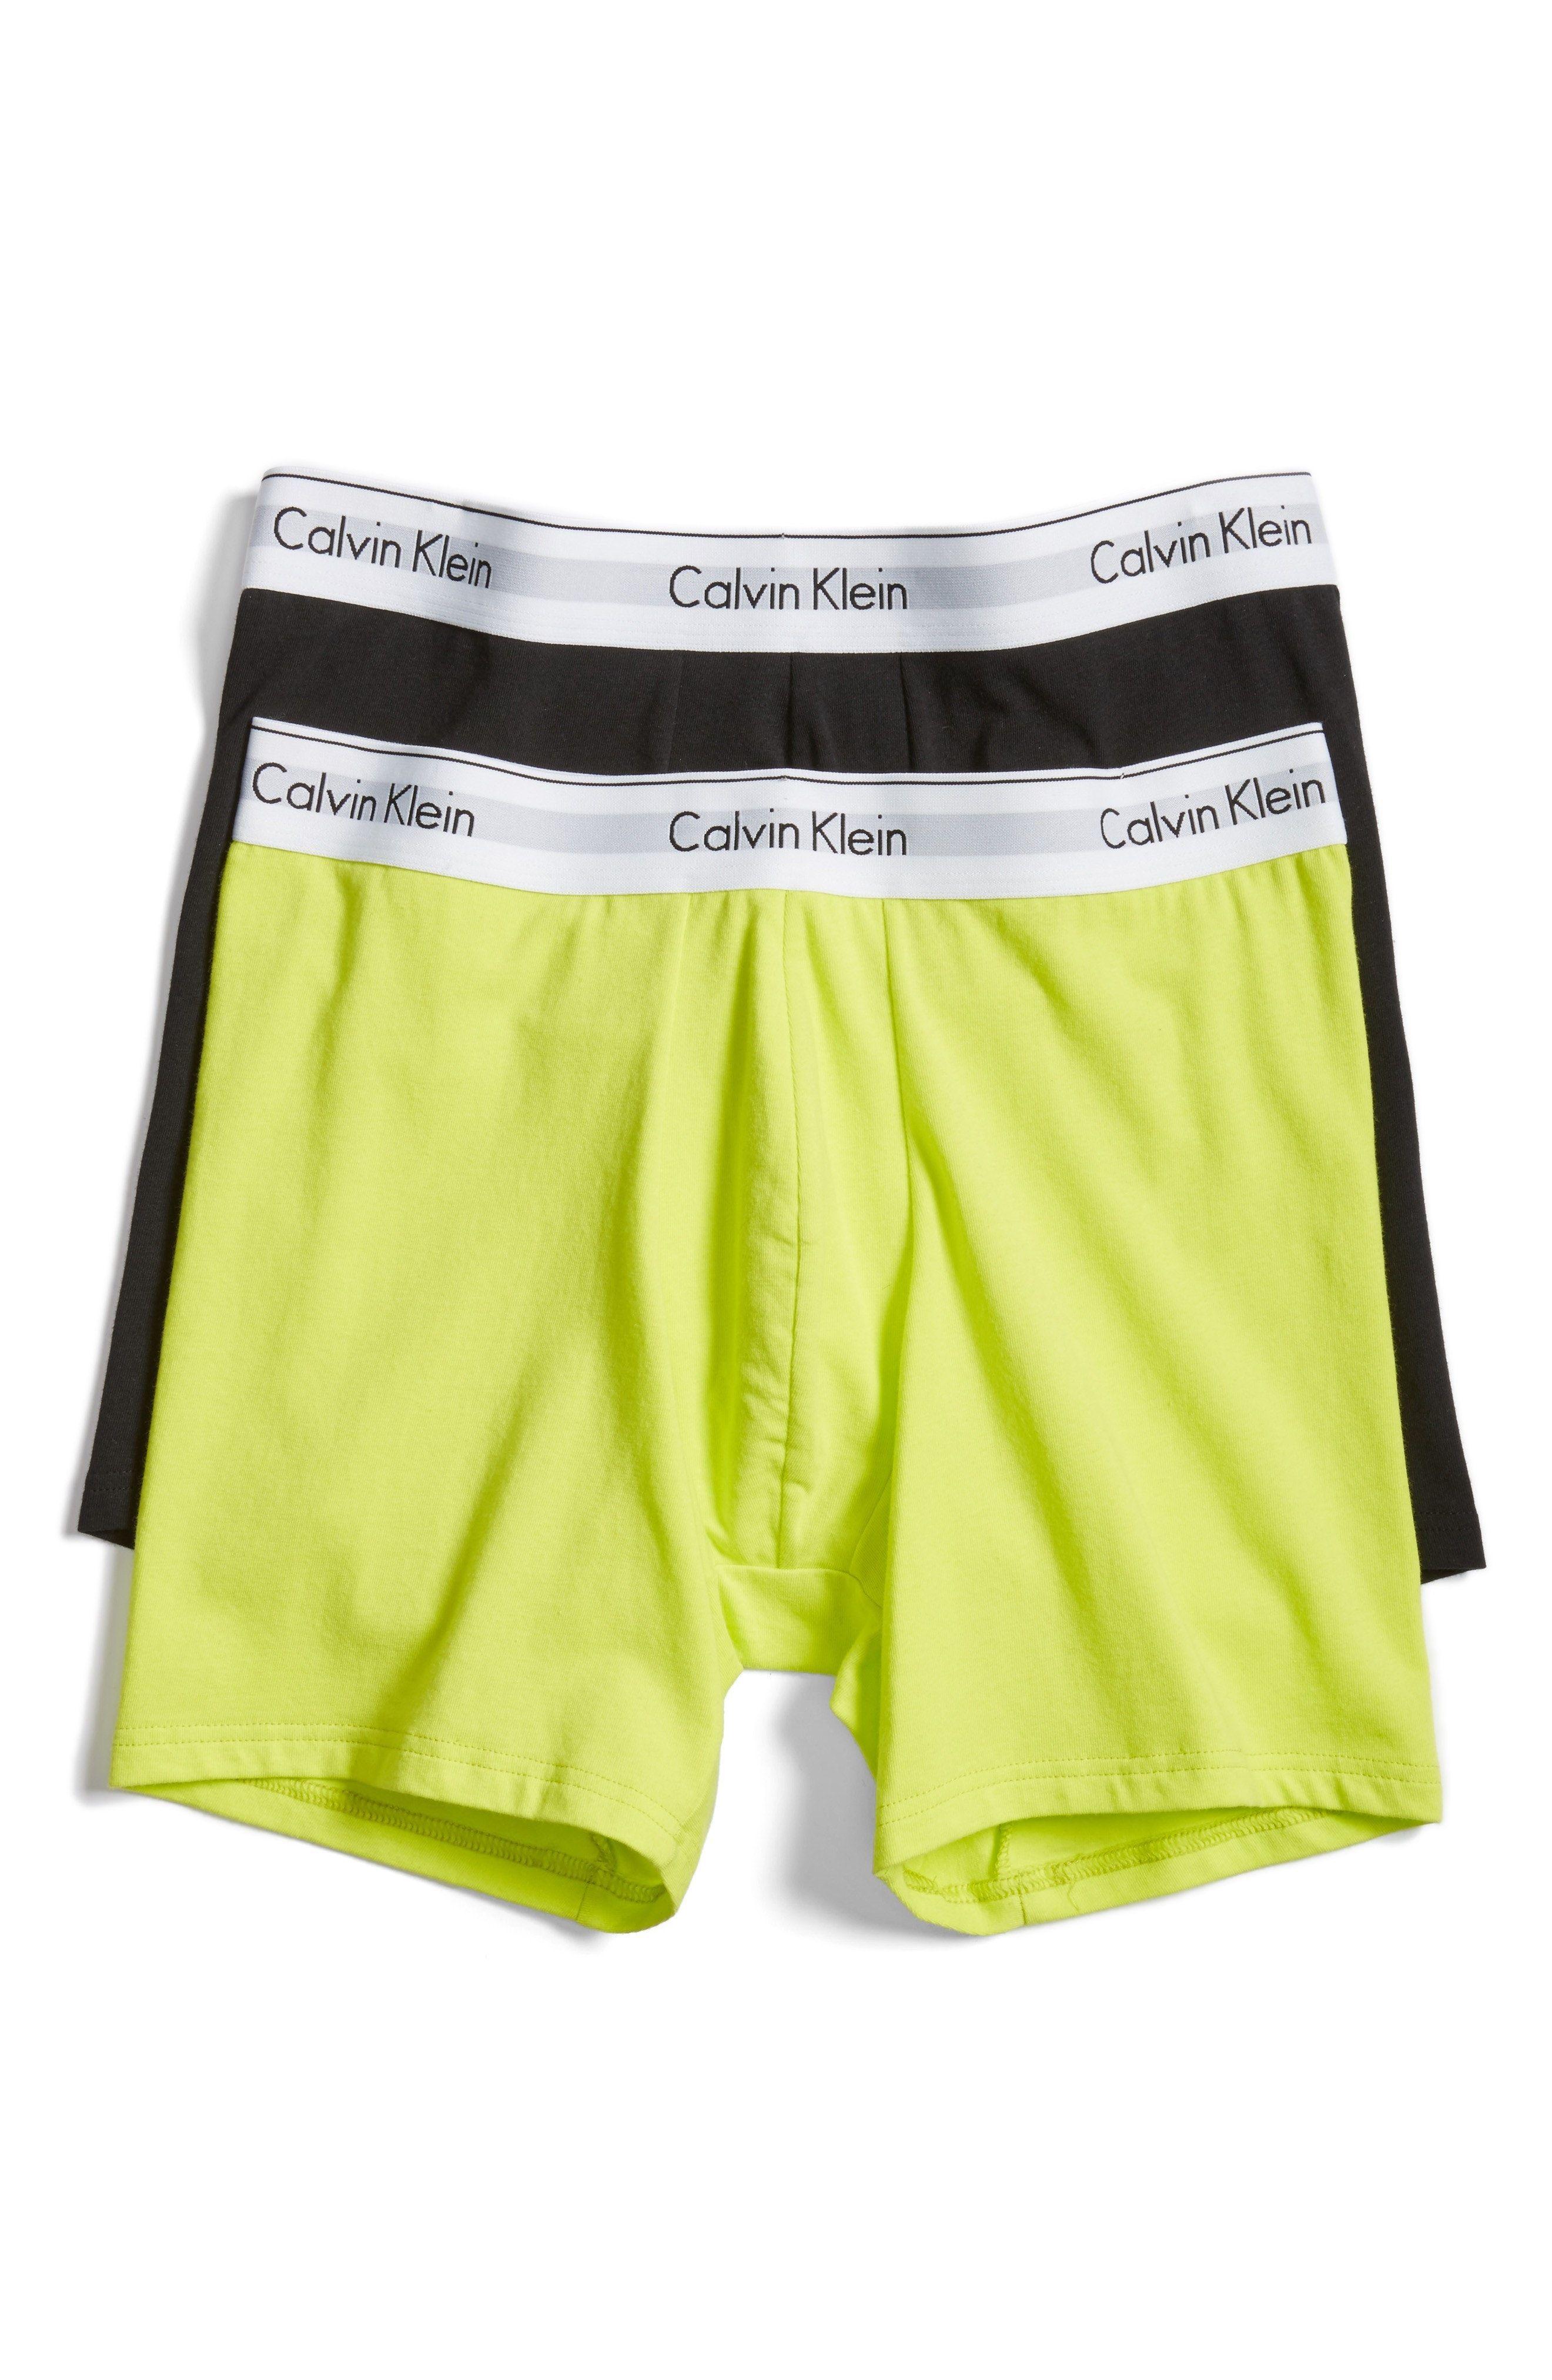 aabb92613eb1 New Calvin Klein Modern Assorted 2-Pack Stretch Cotton Boxer Briefs ,NIGHT  BLUE fashion online. [$29.5]newoffershop win<<